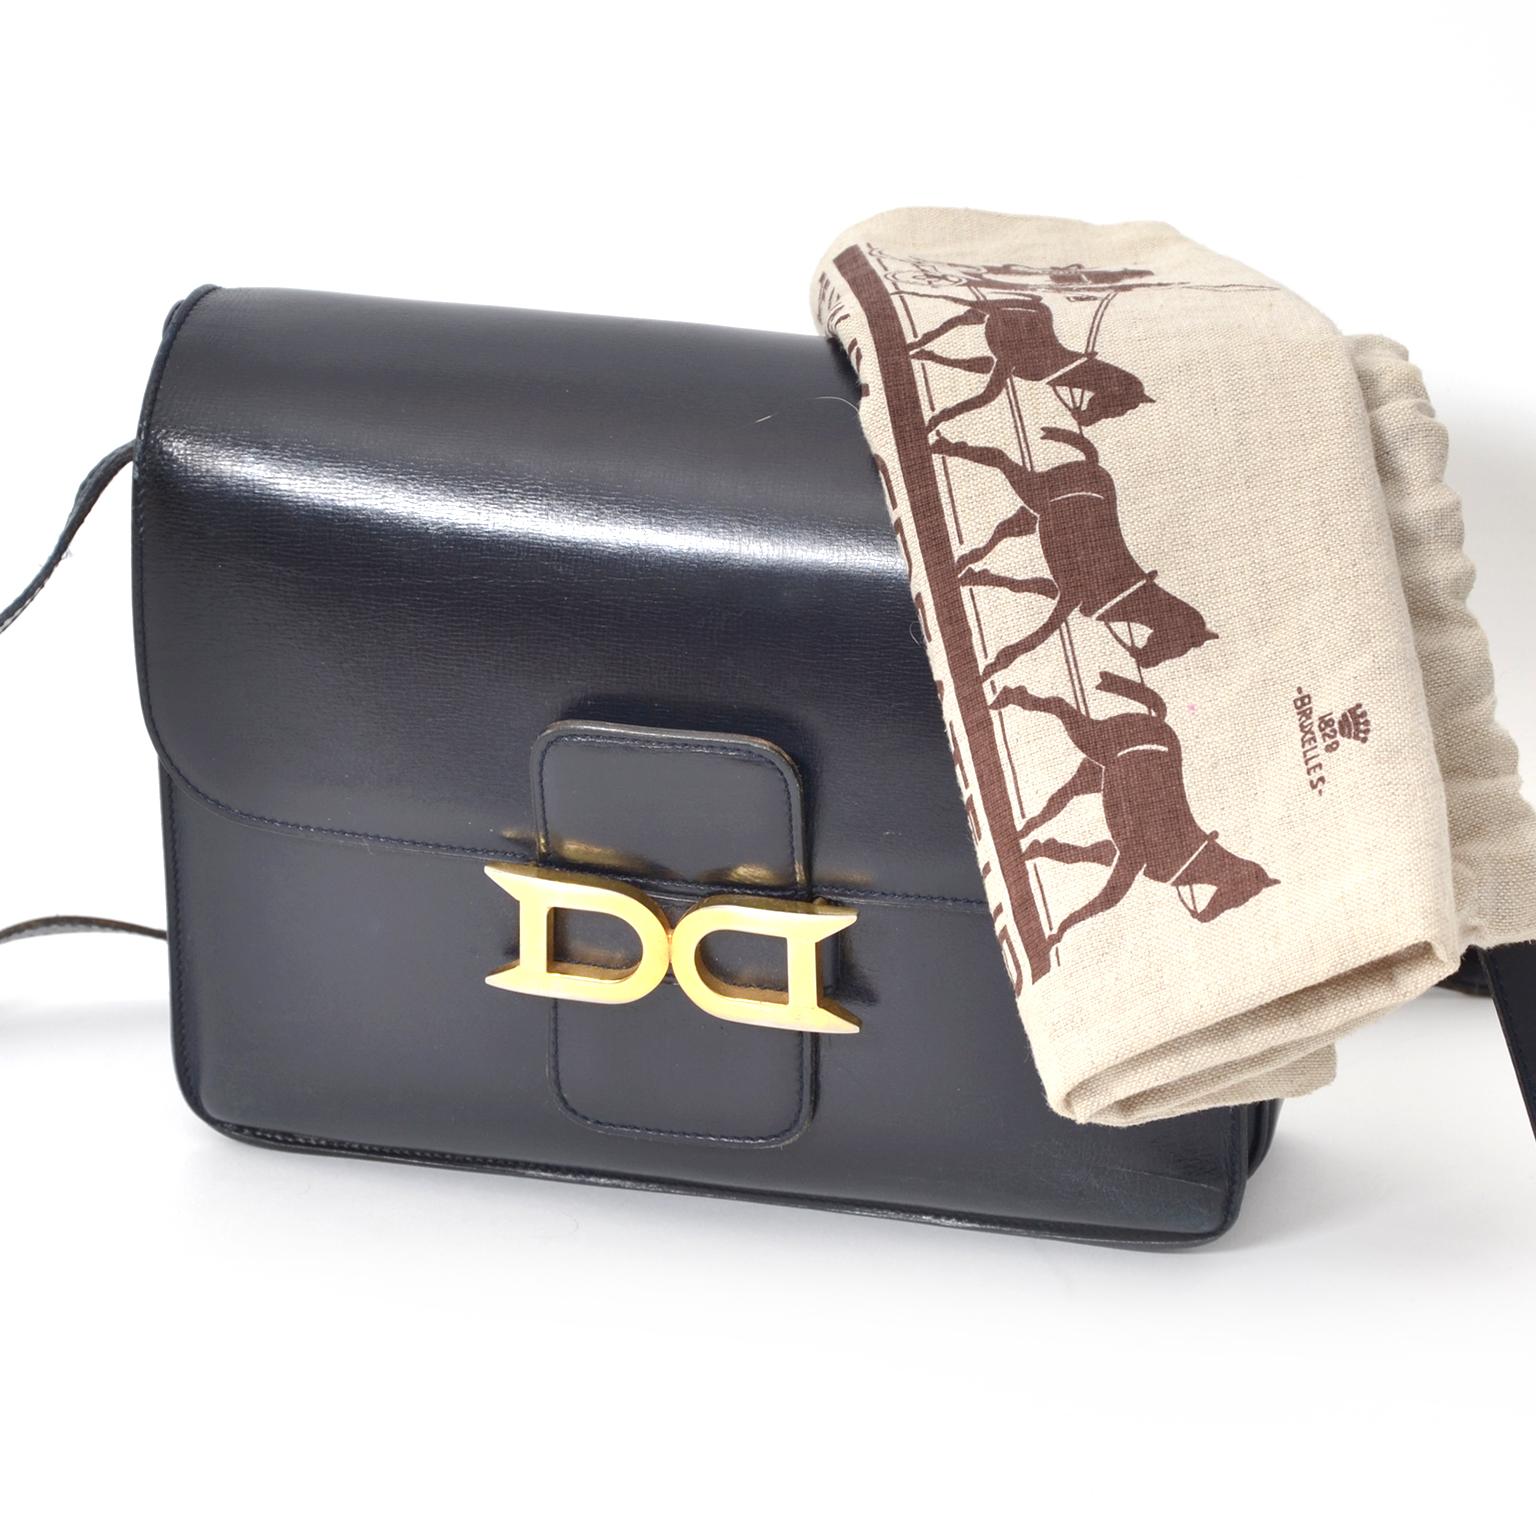 ... koop snel en veilig tweedehands Delvaux Dark Blue Bourgogne Shoulder Bag  boetiek België, antwerpen ab1b61b1b71